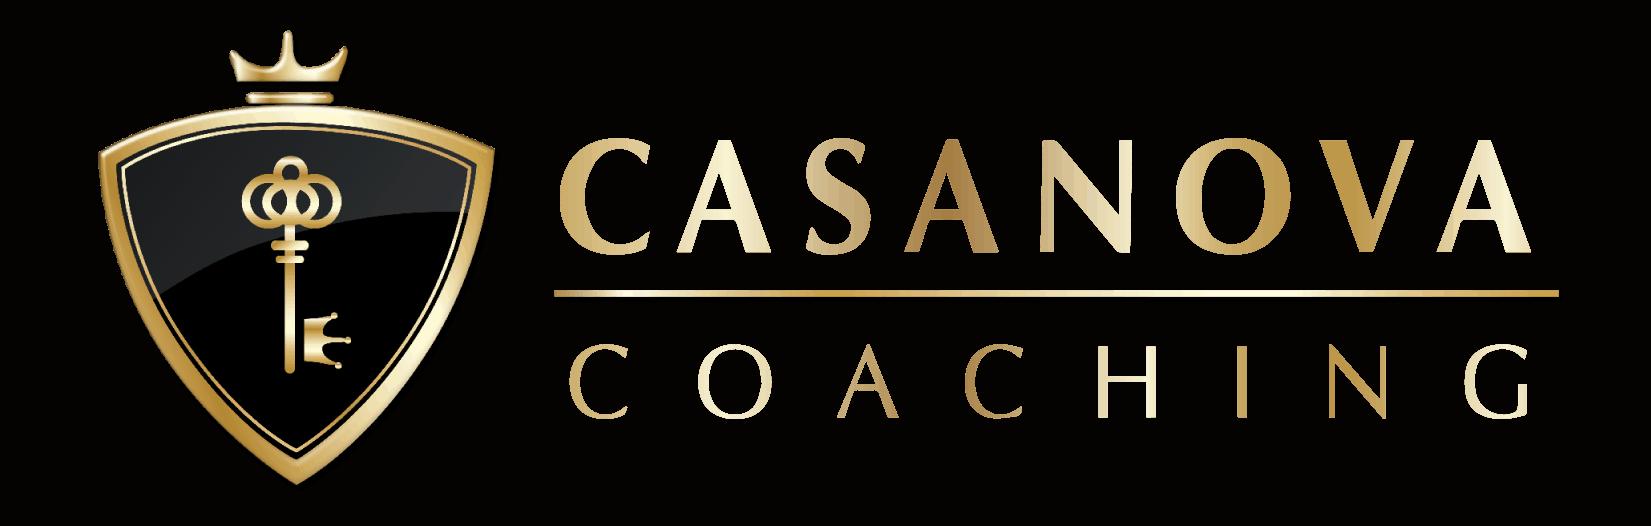 Casanova Coaching Logo Gold